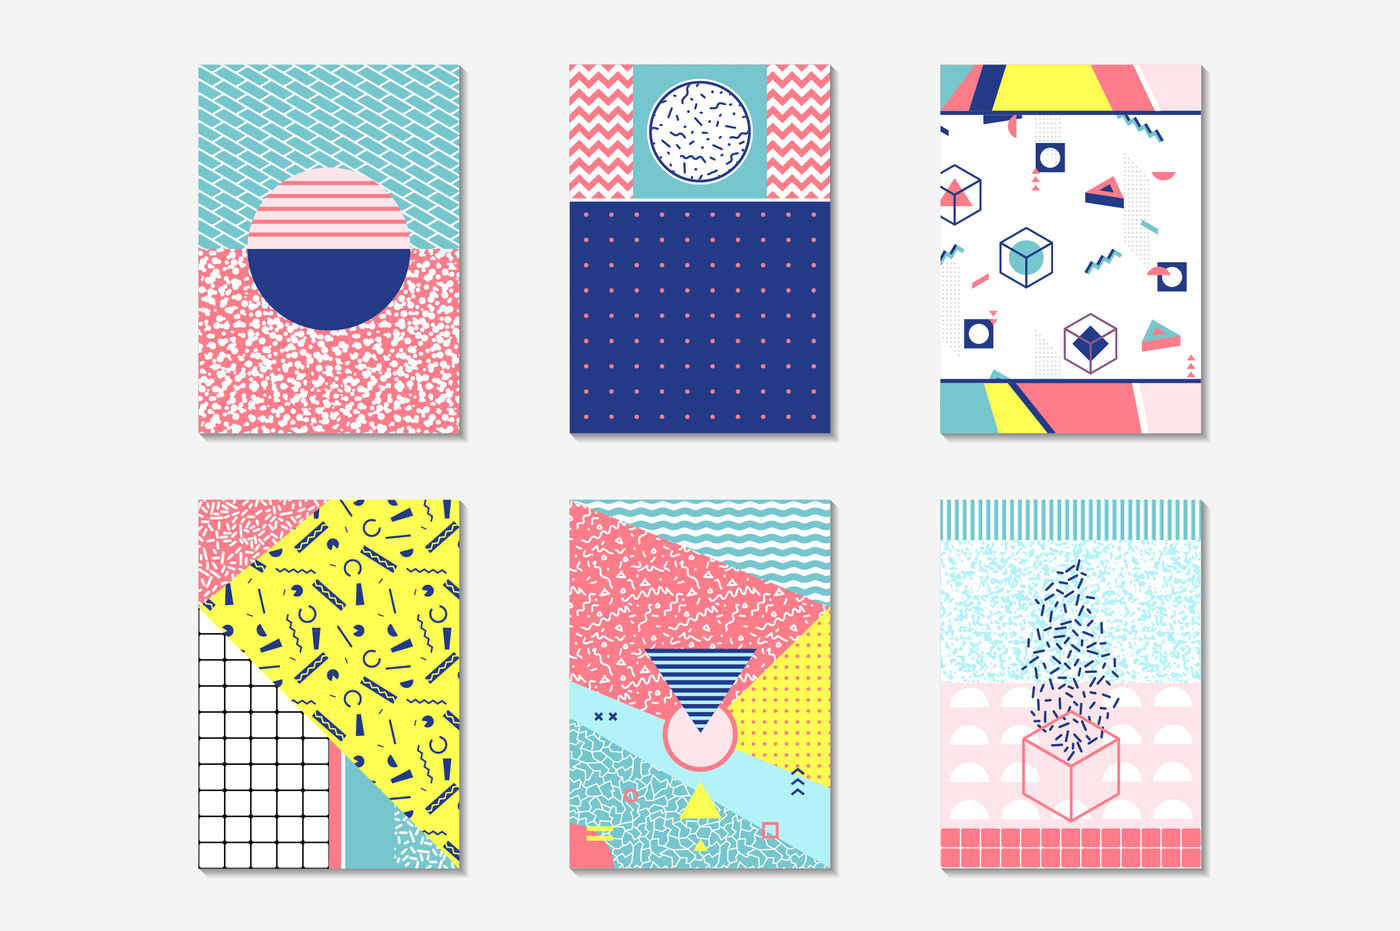 Geometric 80's style patterns By Antikwar | TheHungryJPEG com